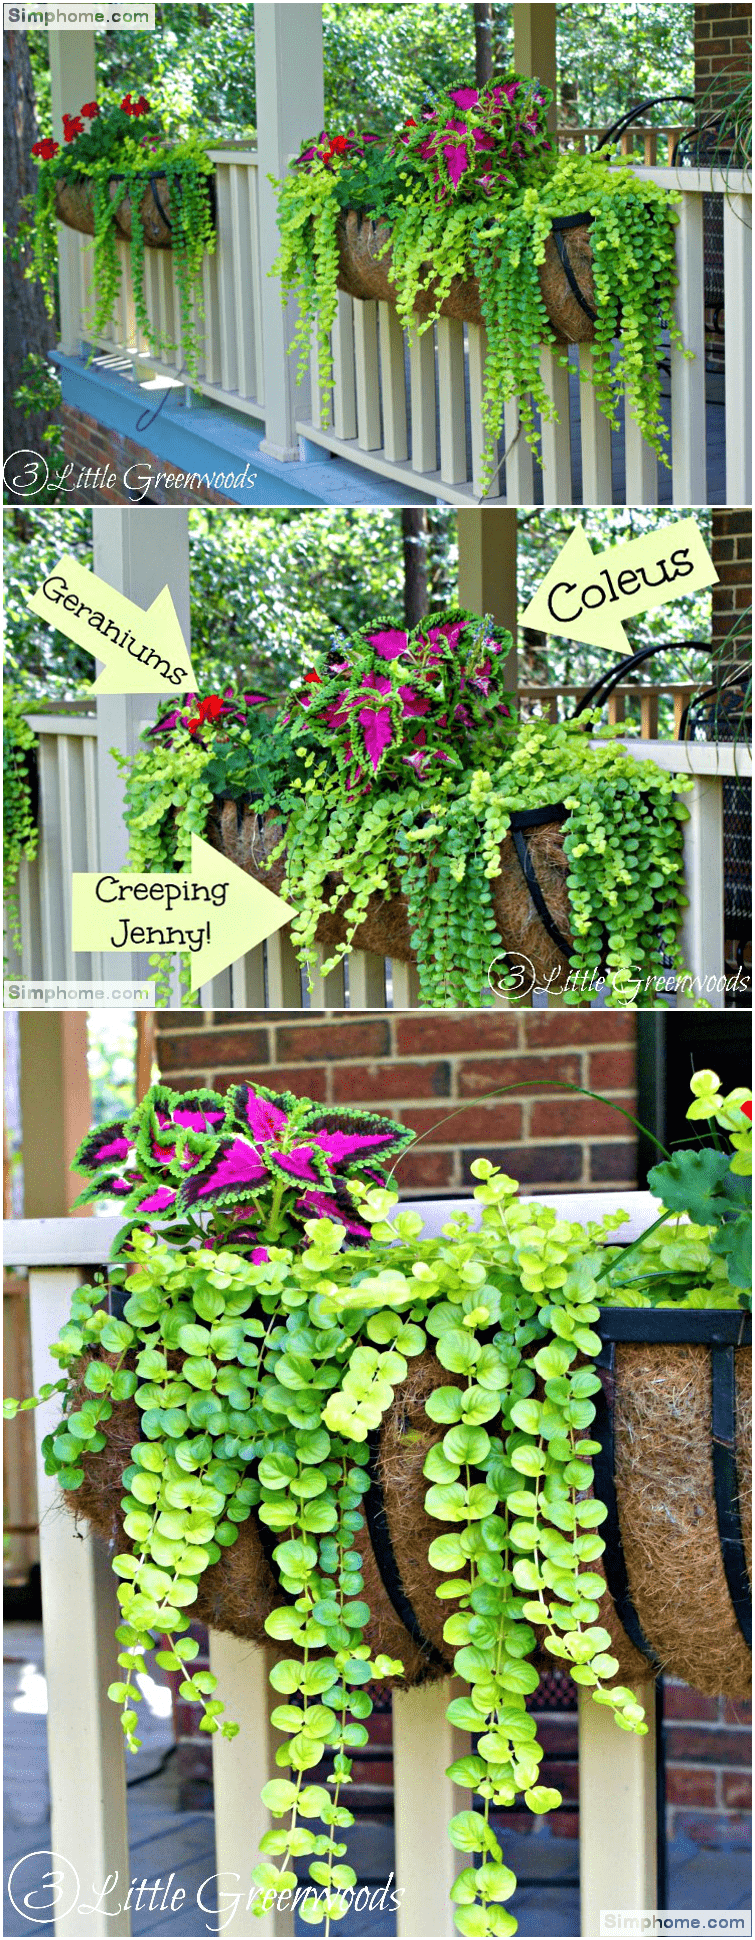 1.Give a Lively Lift with Plants via Simphome.com